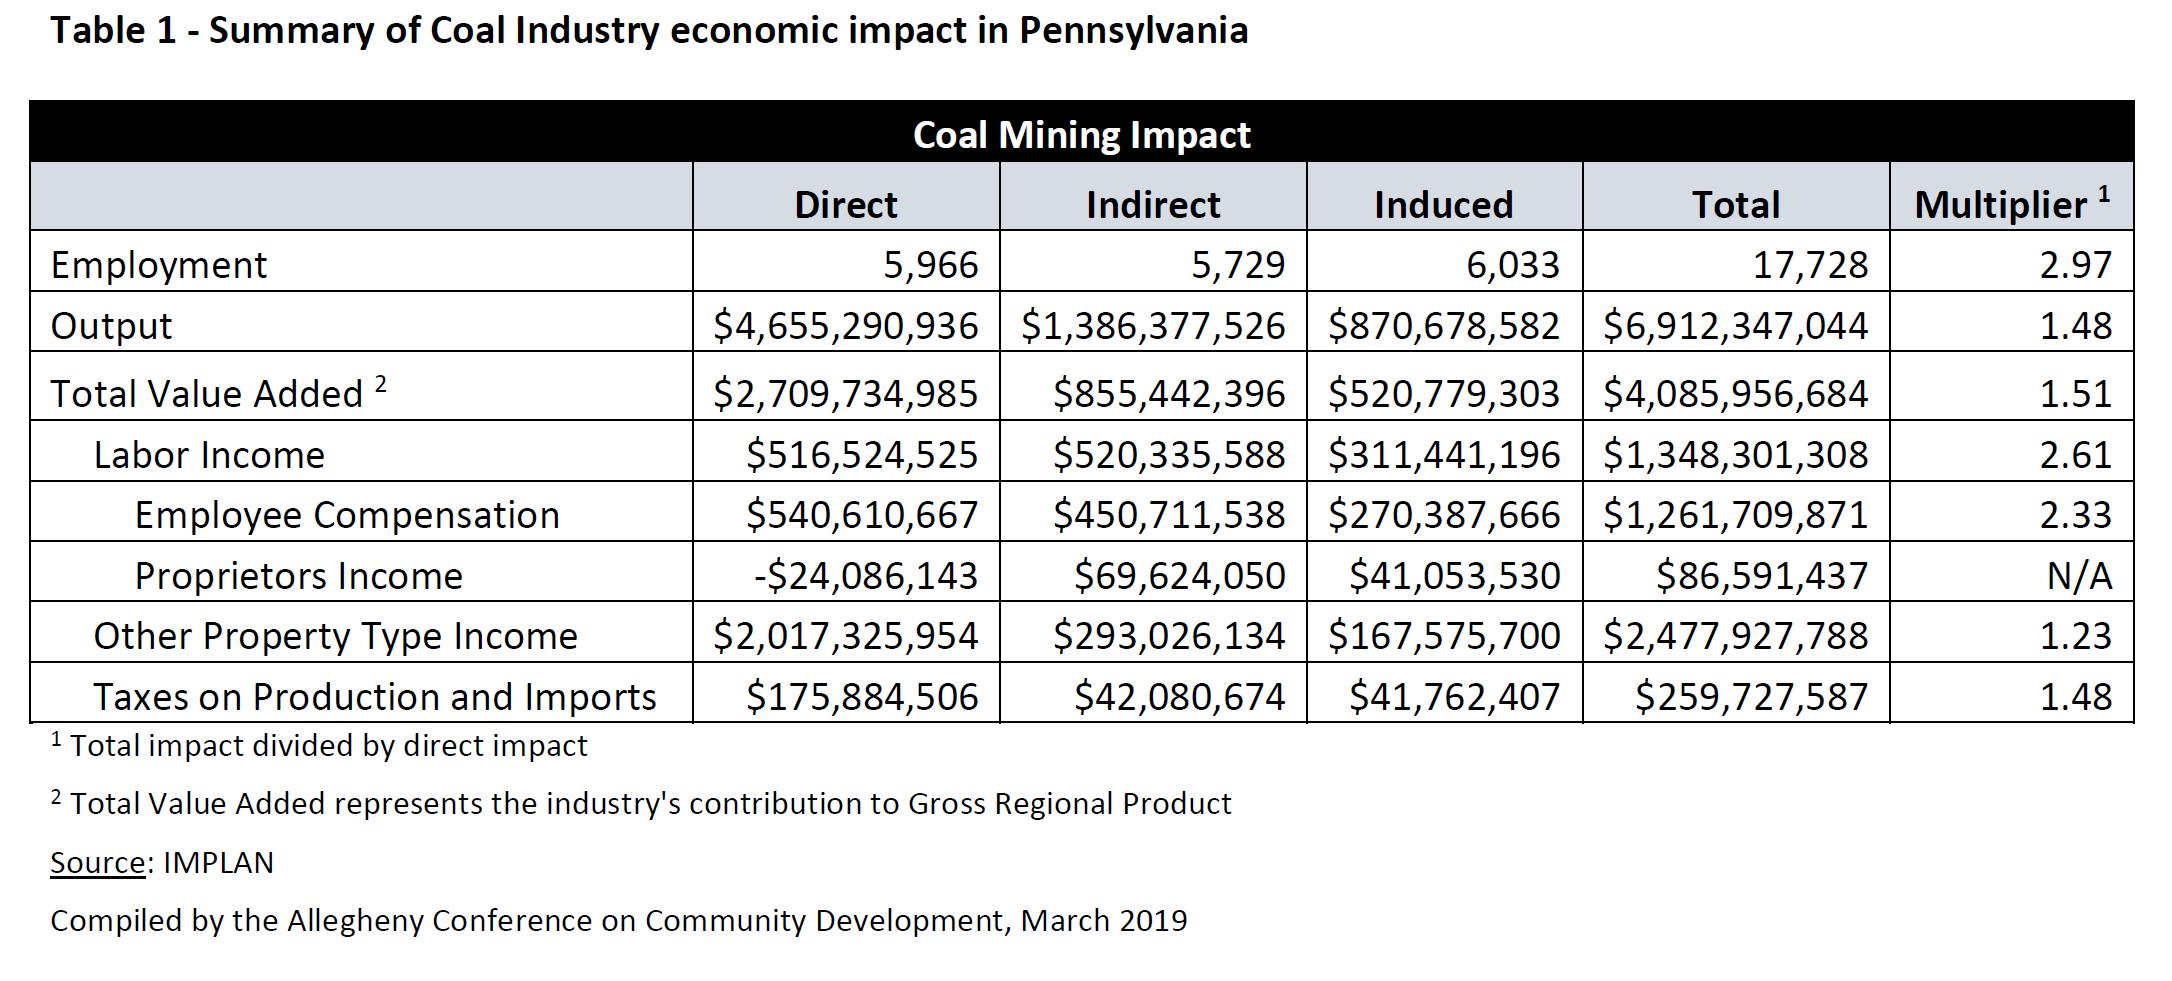 Summary of coal industry economic impact in Pennsylvania